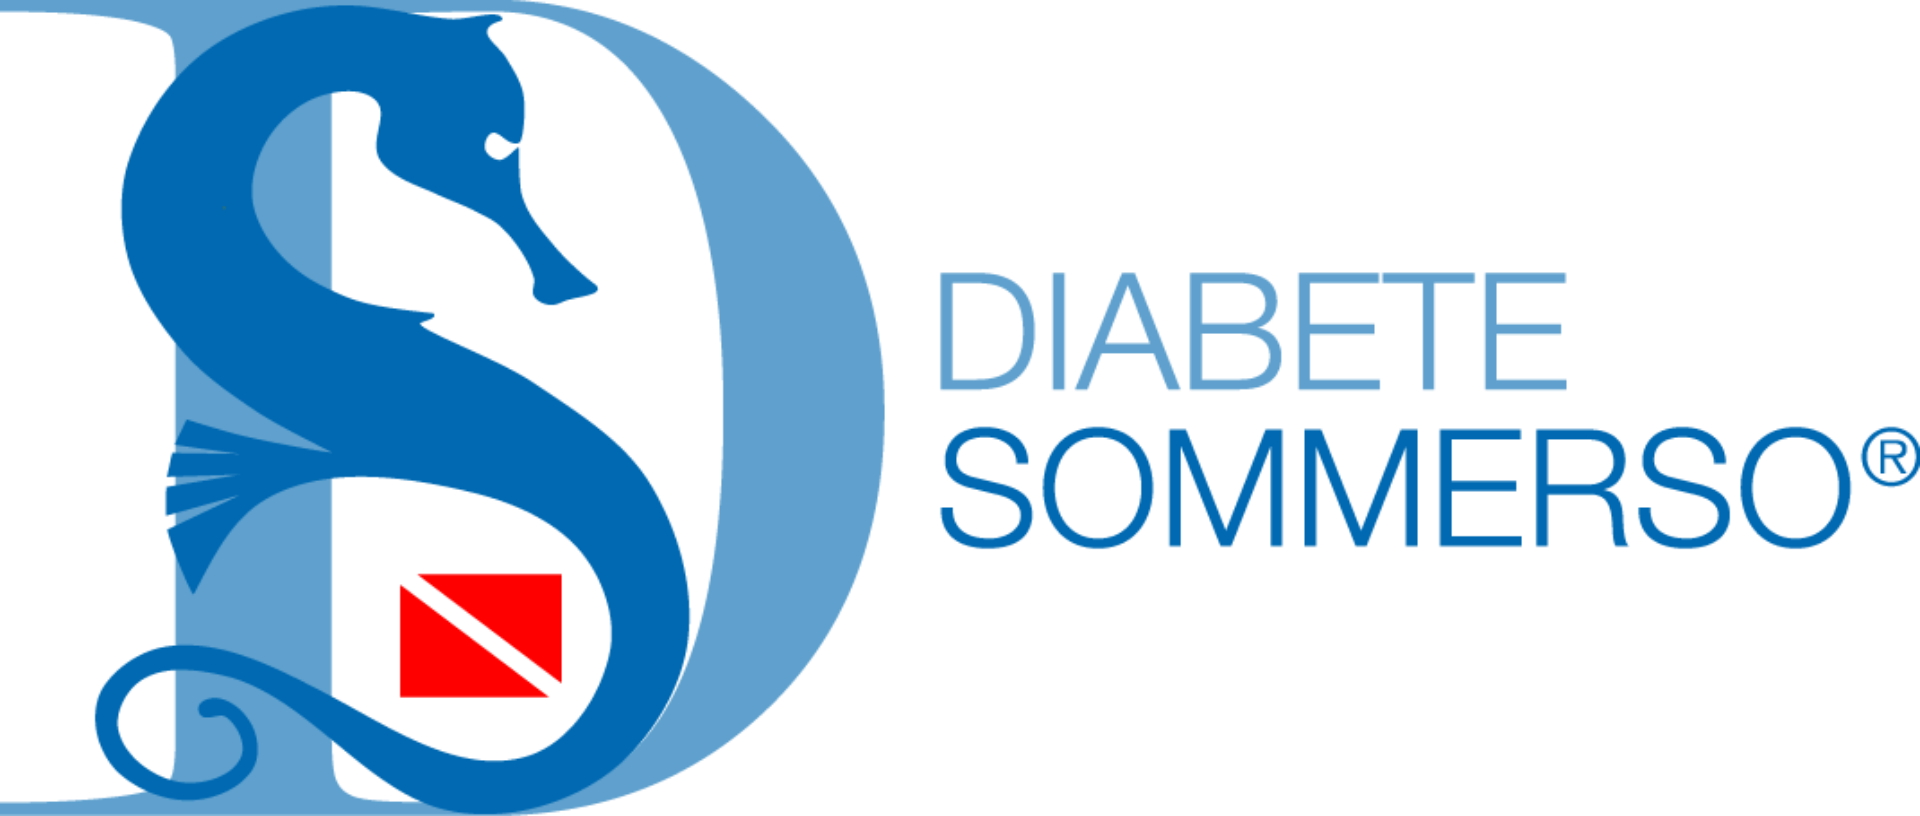 Diabete Sommerso ONLUS